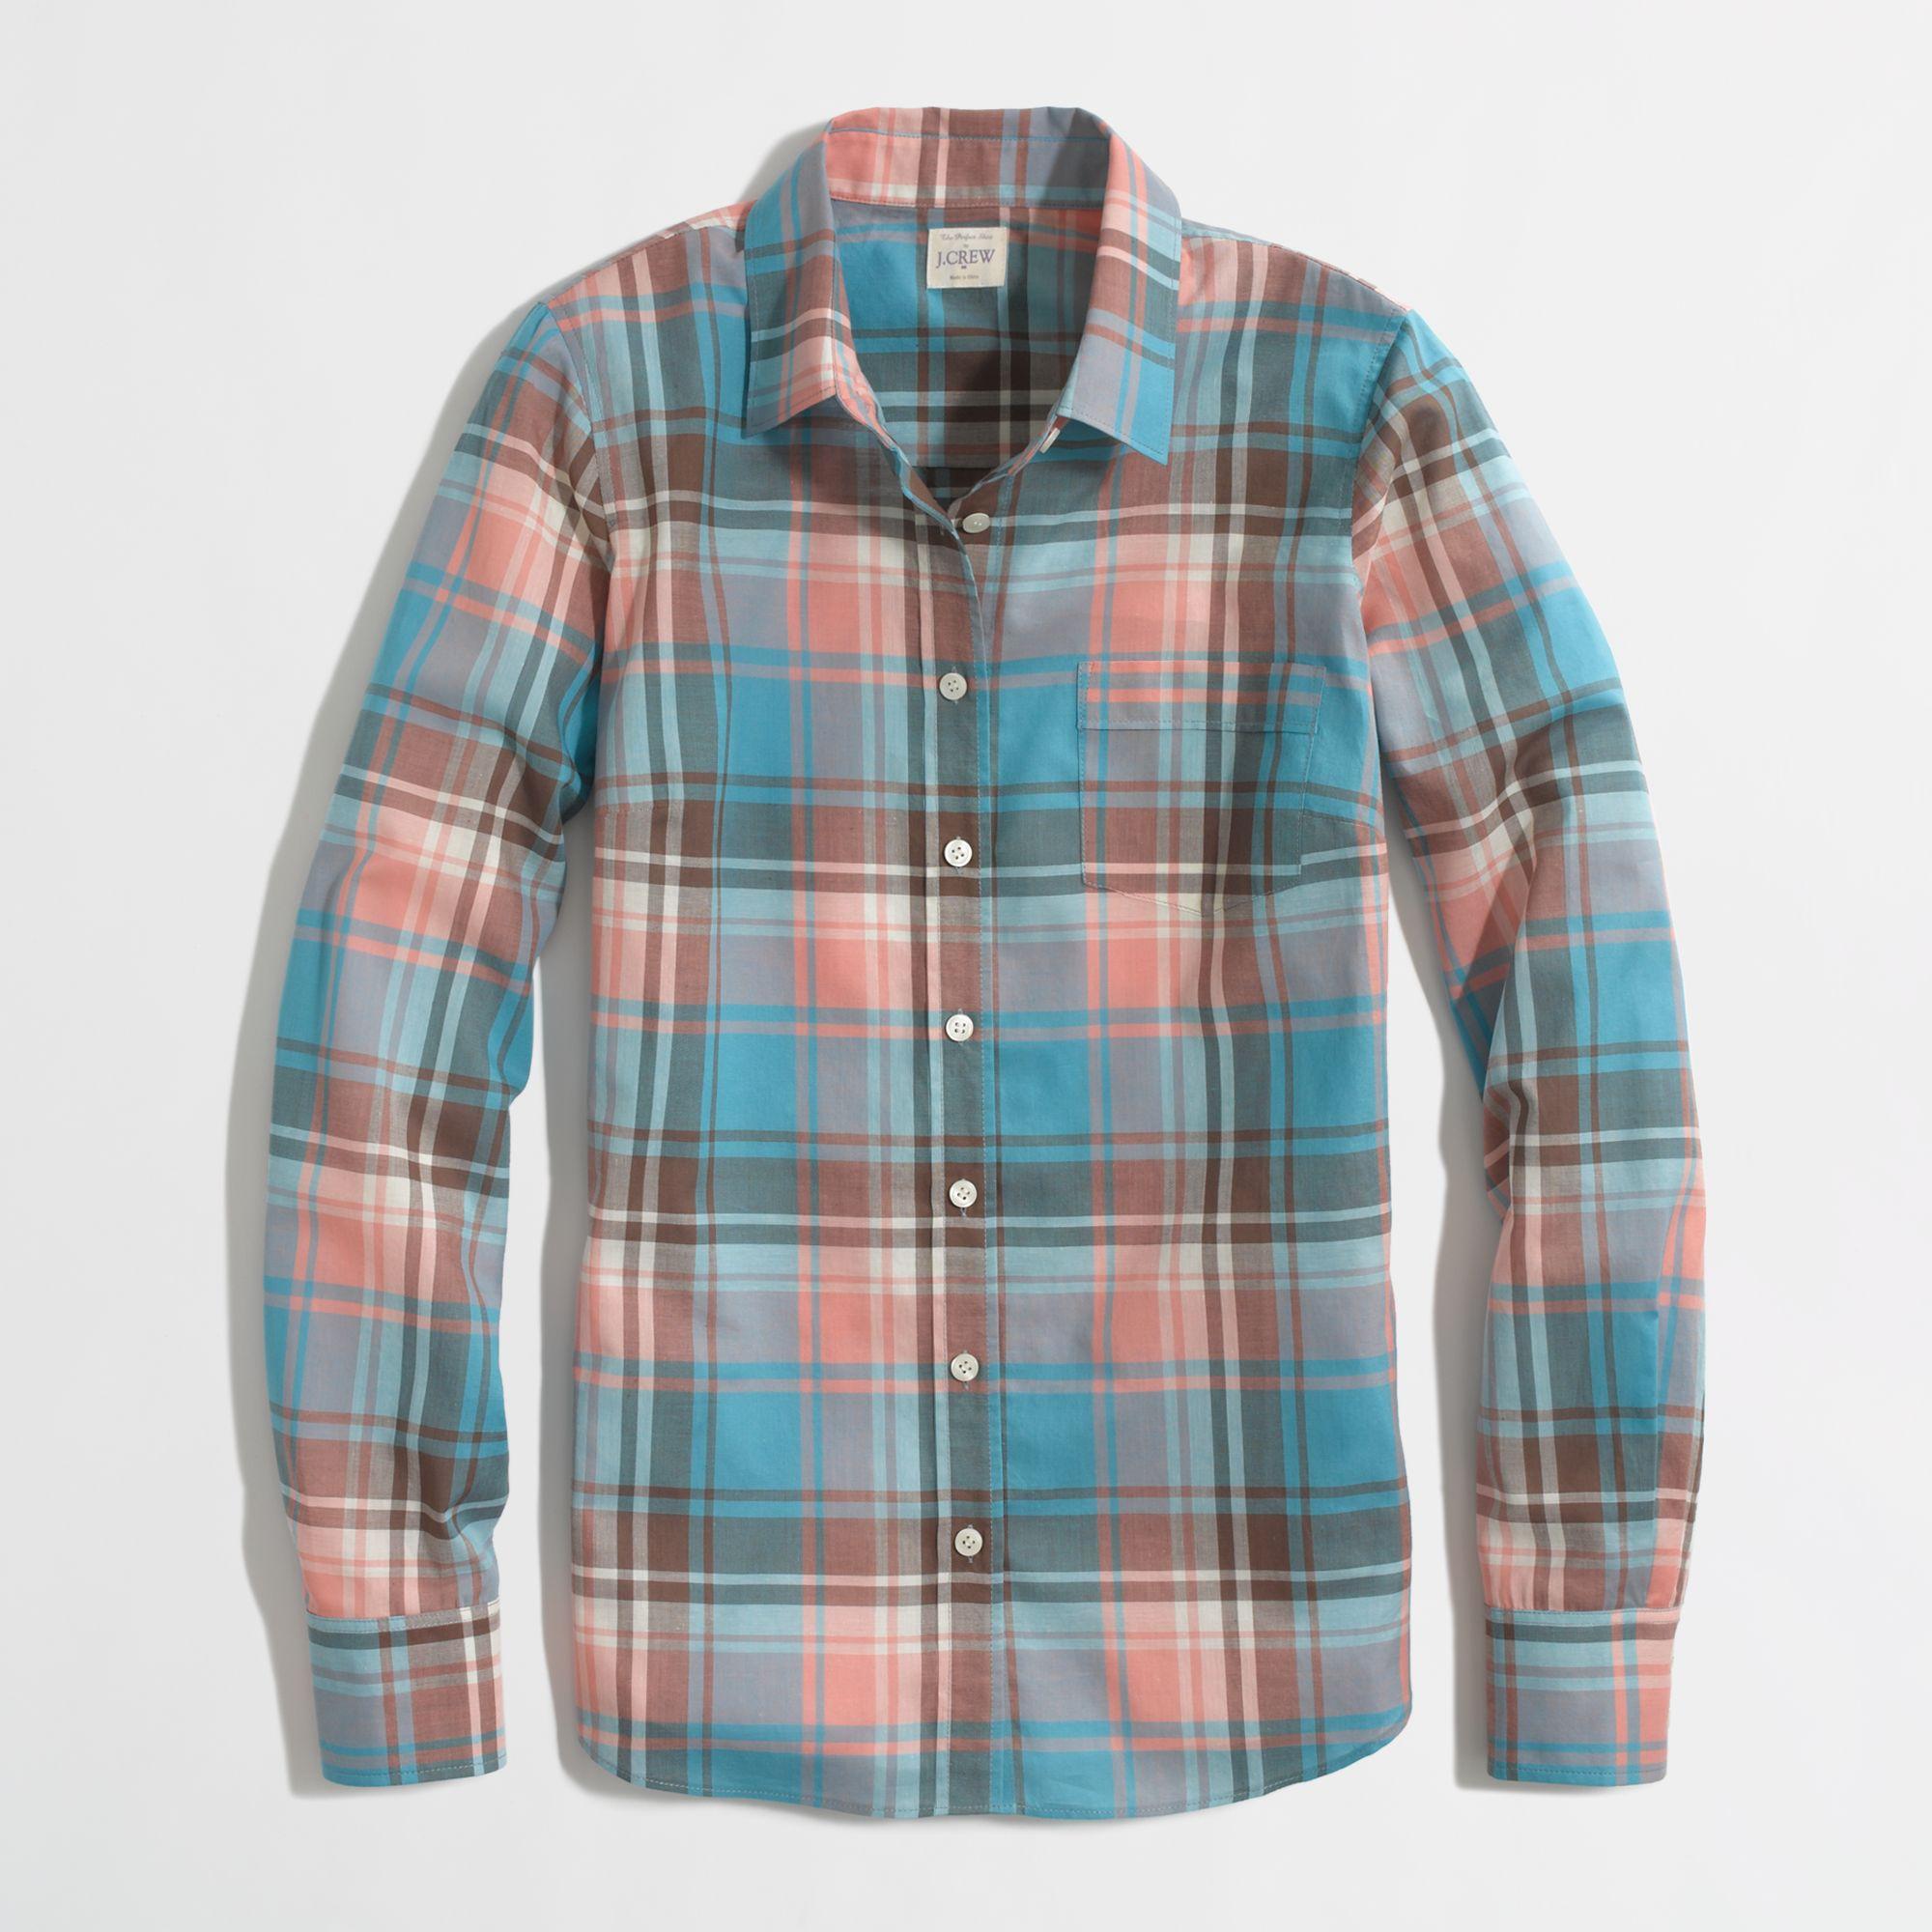 1cc42b63 J.Crew Factory Classic Button-down Shirt in Plaid in Blue - Lyst